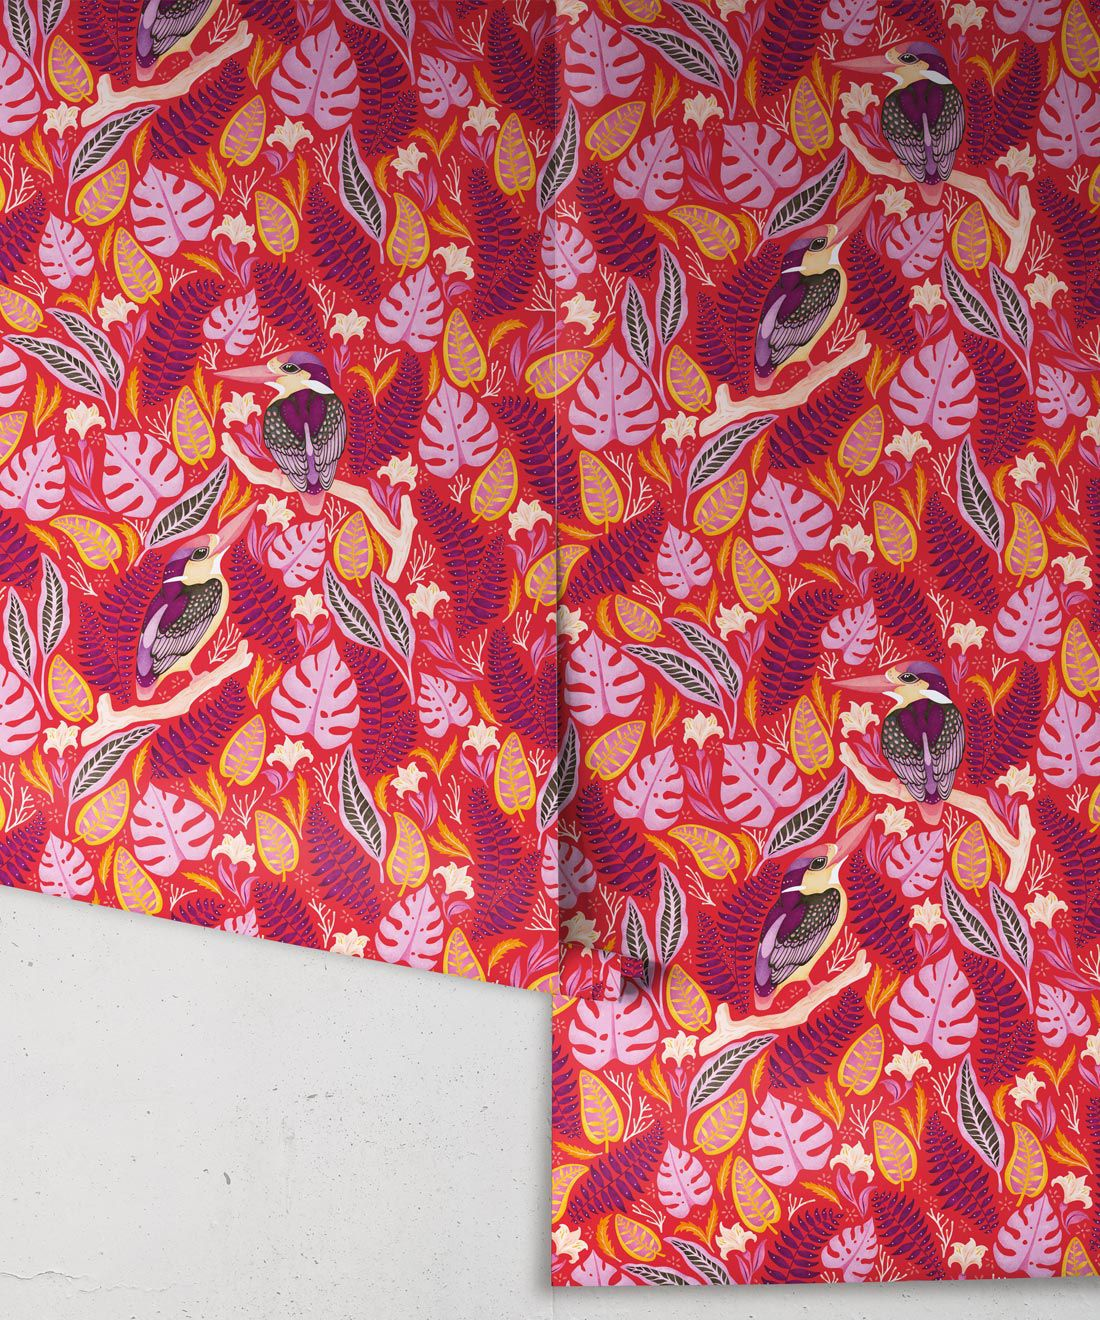 Kingfisher Wallpaper • Bird Wallpaper • Red Wallpaper Rolls